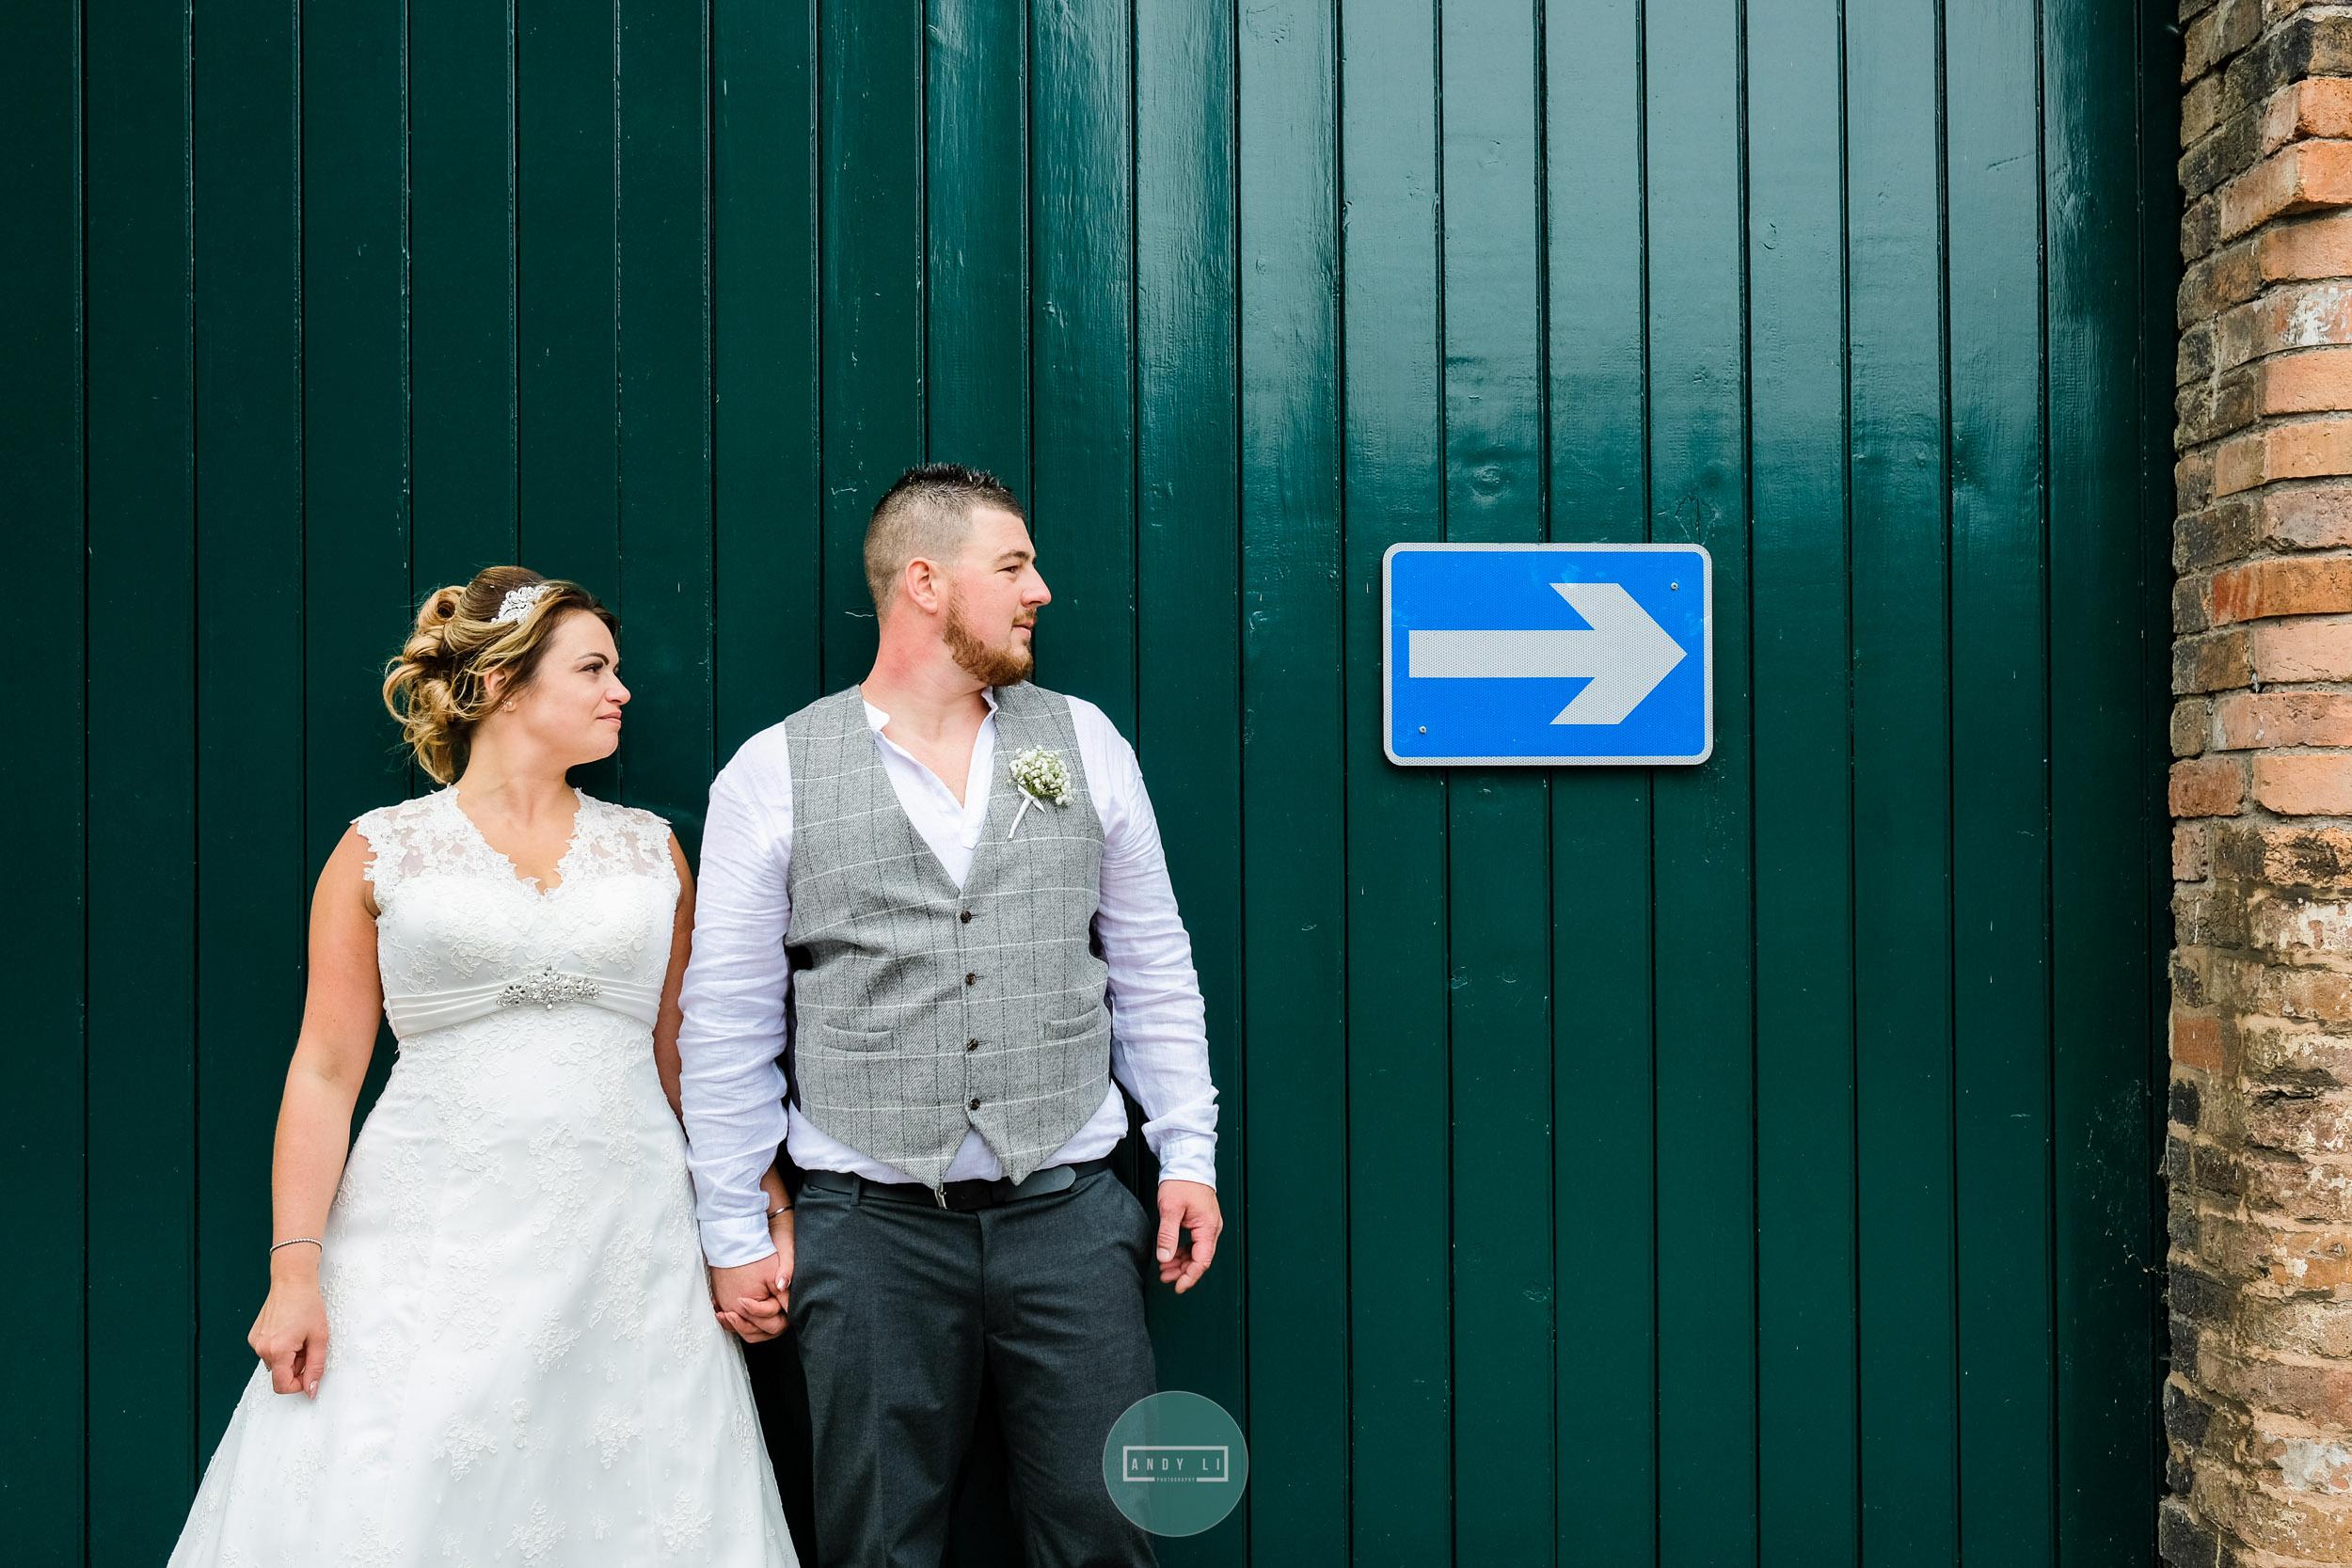 Enginuity Ironbridge Wedding Photographer-086-AXT25840.jpg